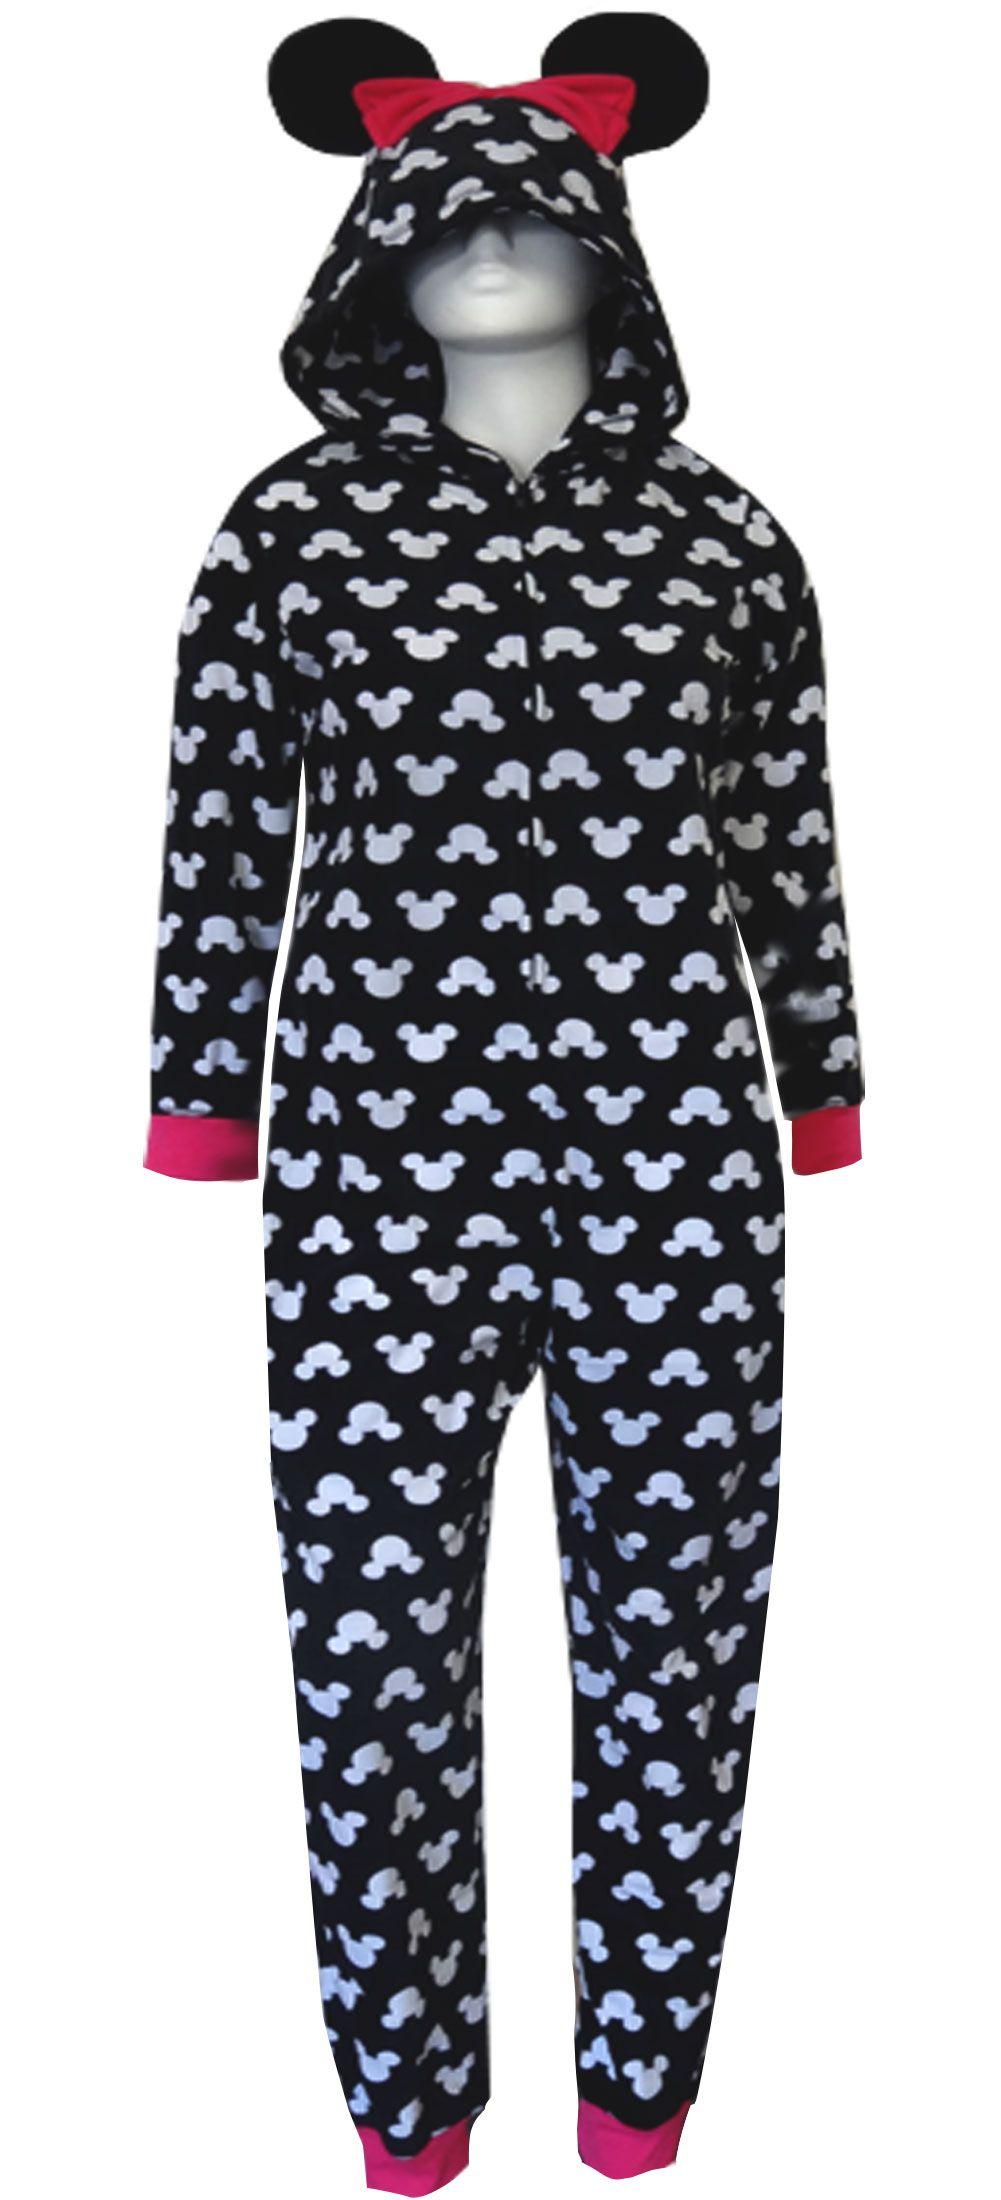 WebUndies.com Disney s Minnie Ears On Black Hooded Onesie Pajama ... b3e80158a